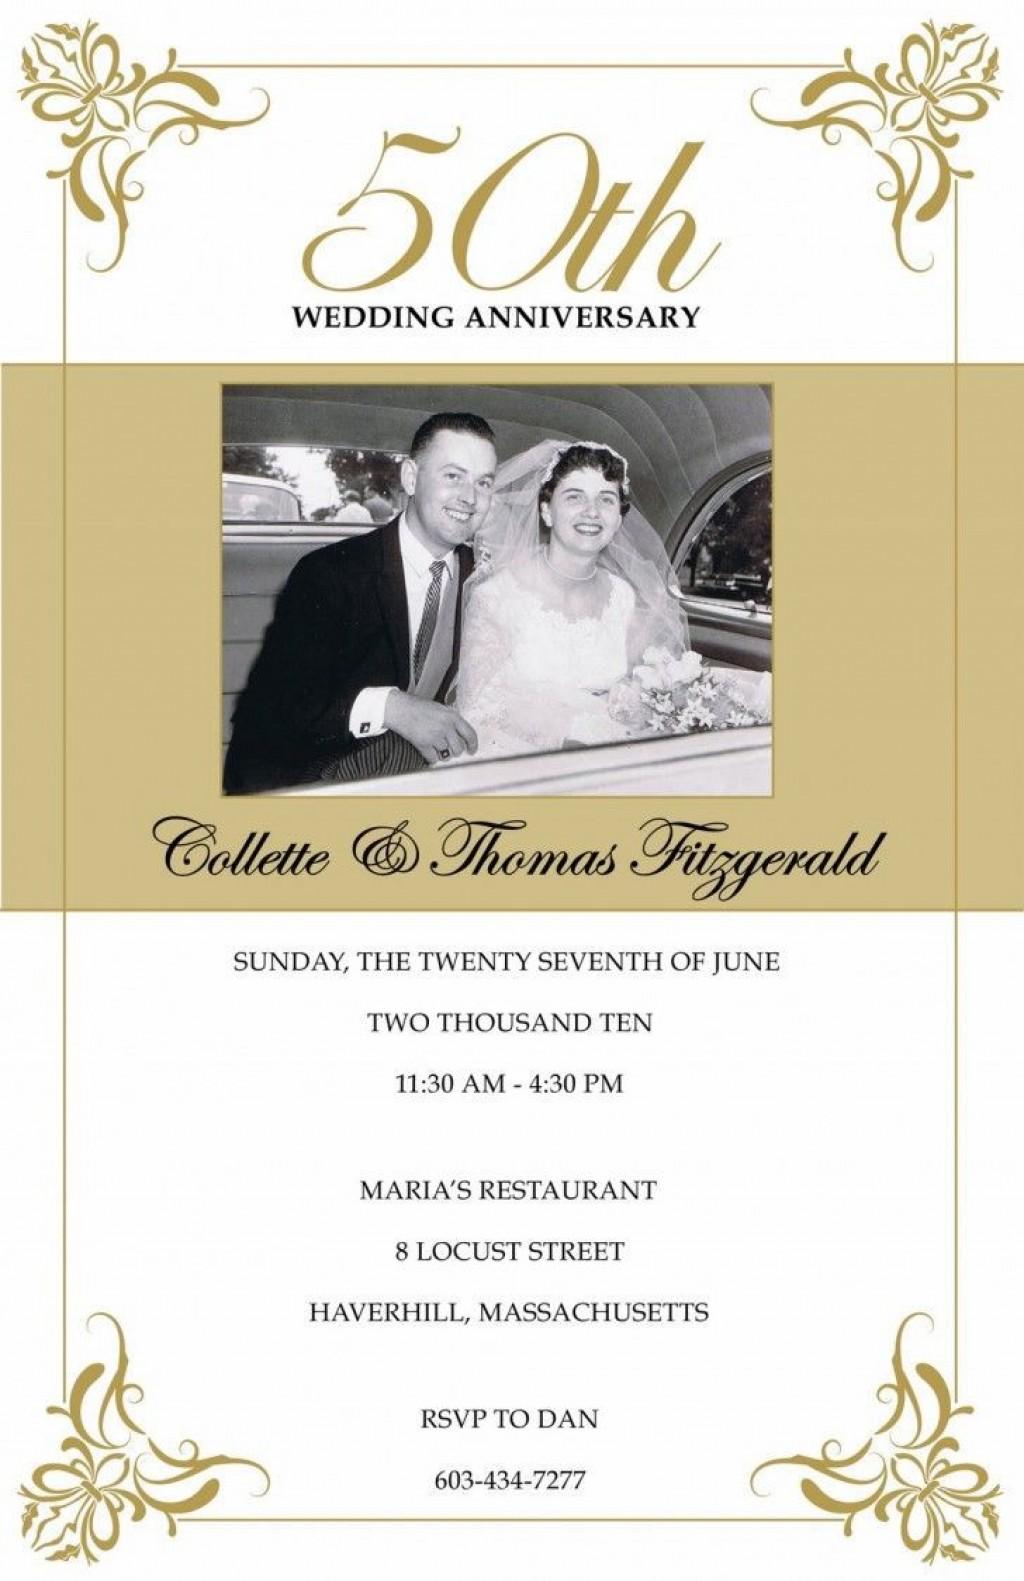 008 Wonderful Golden Wedding Anniversary Invitation Template Free Example  50th Microsoft Word DownloadLarge